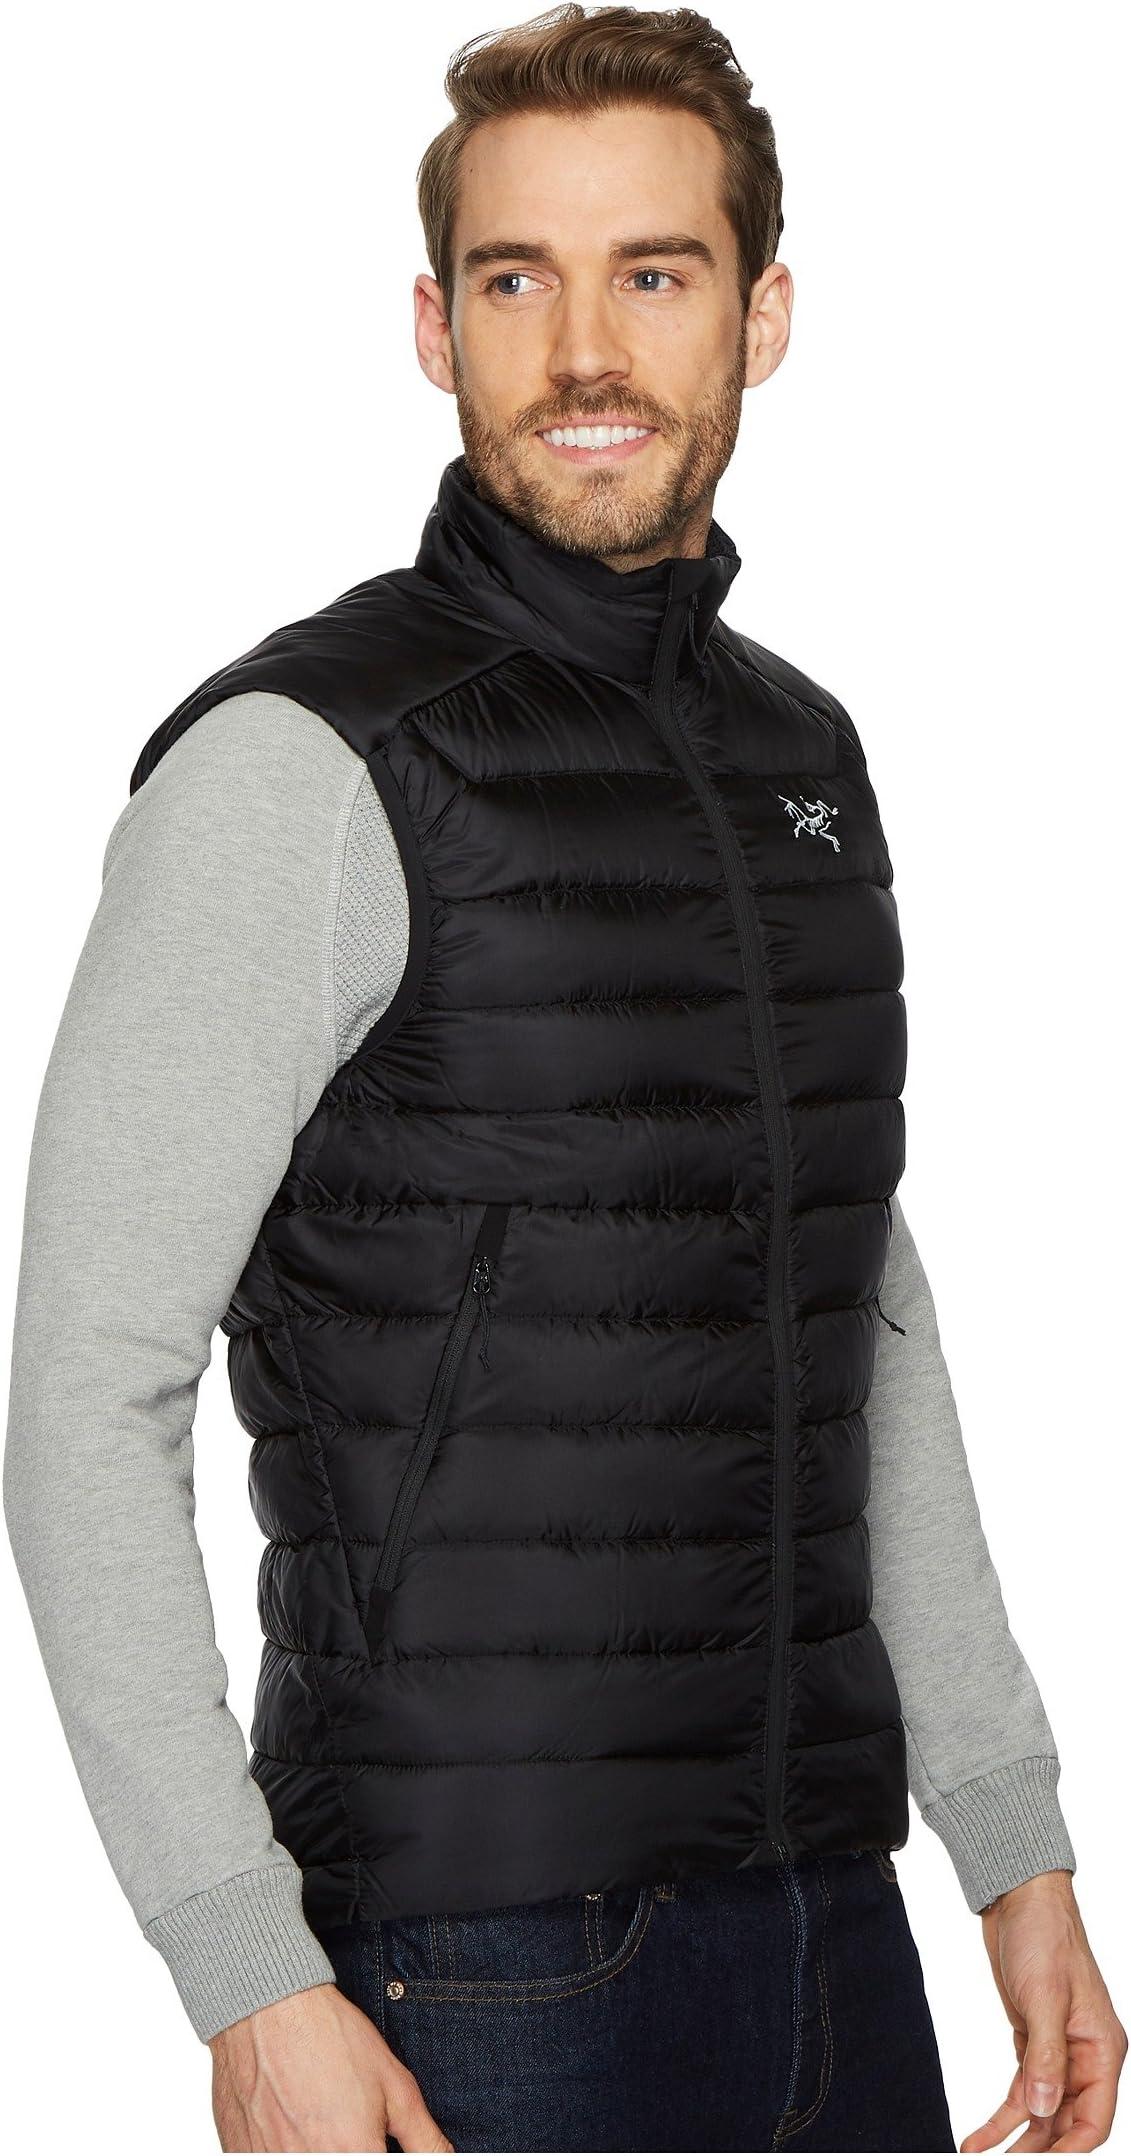 Arc'teryx Cerium LT Vest ed6kX